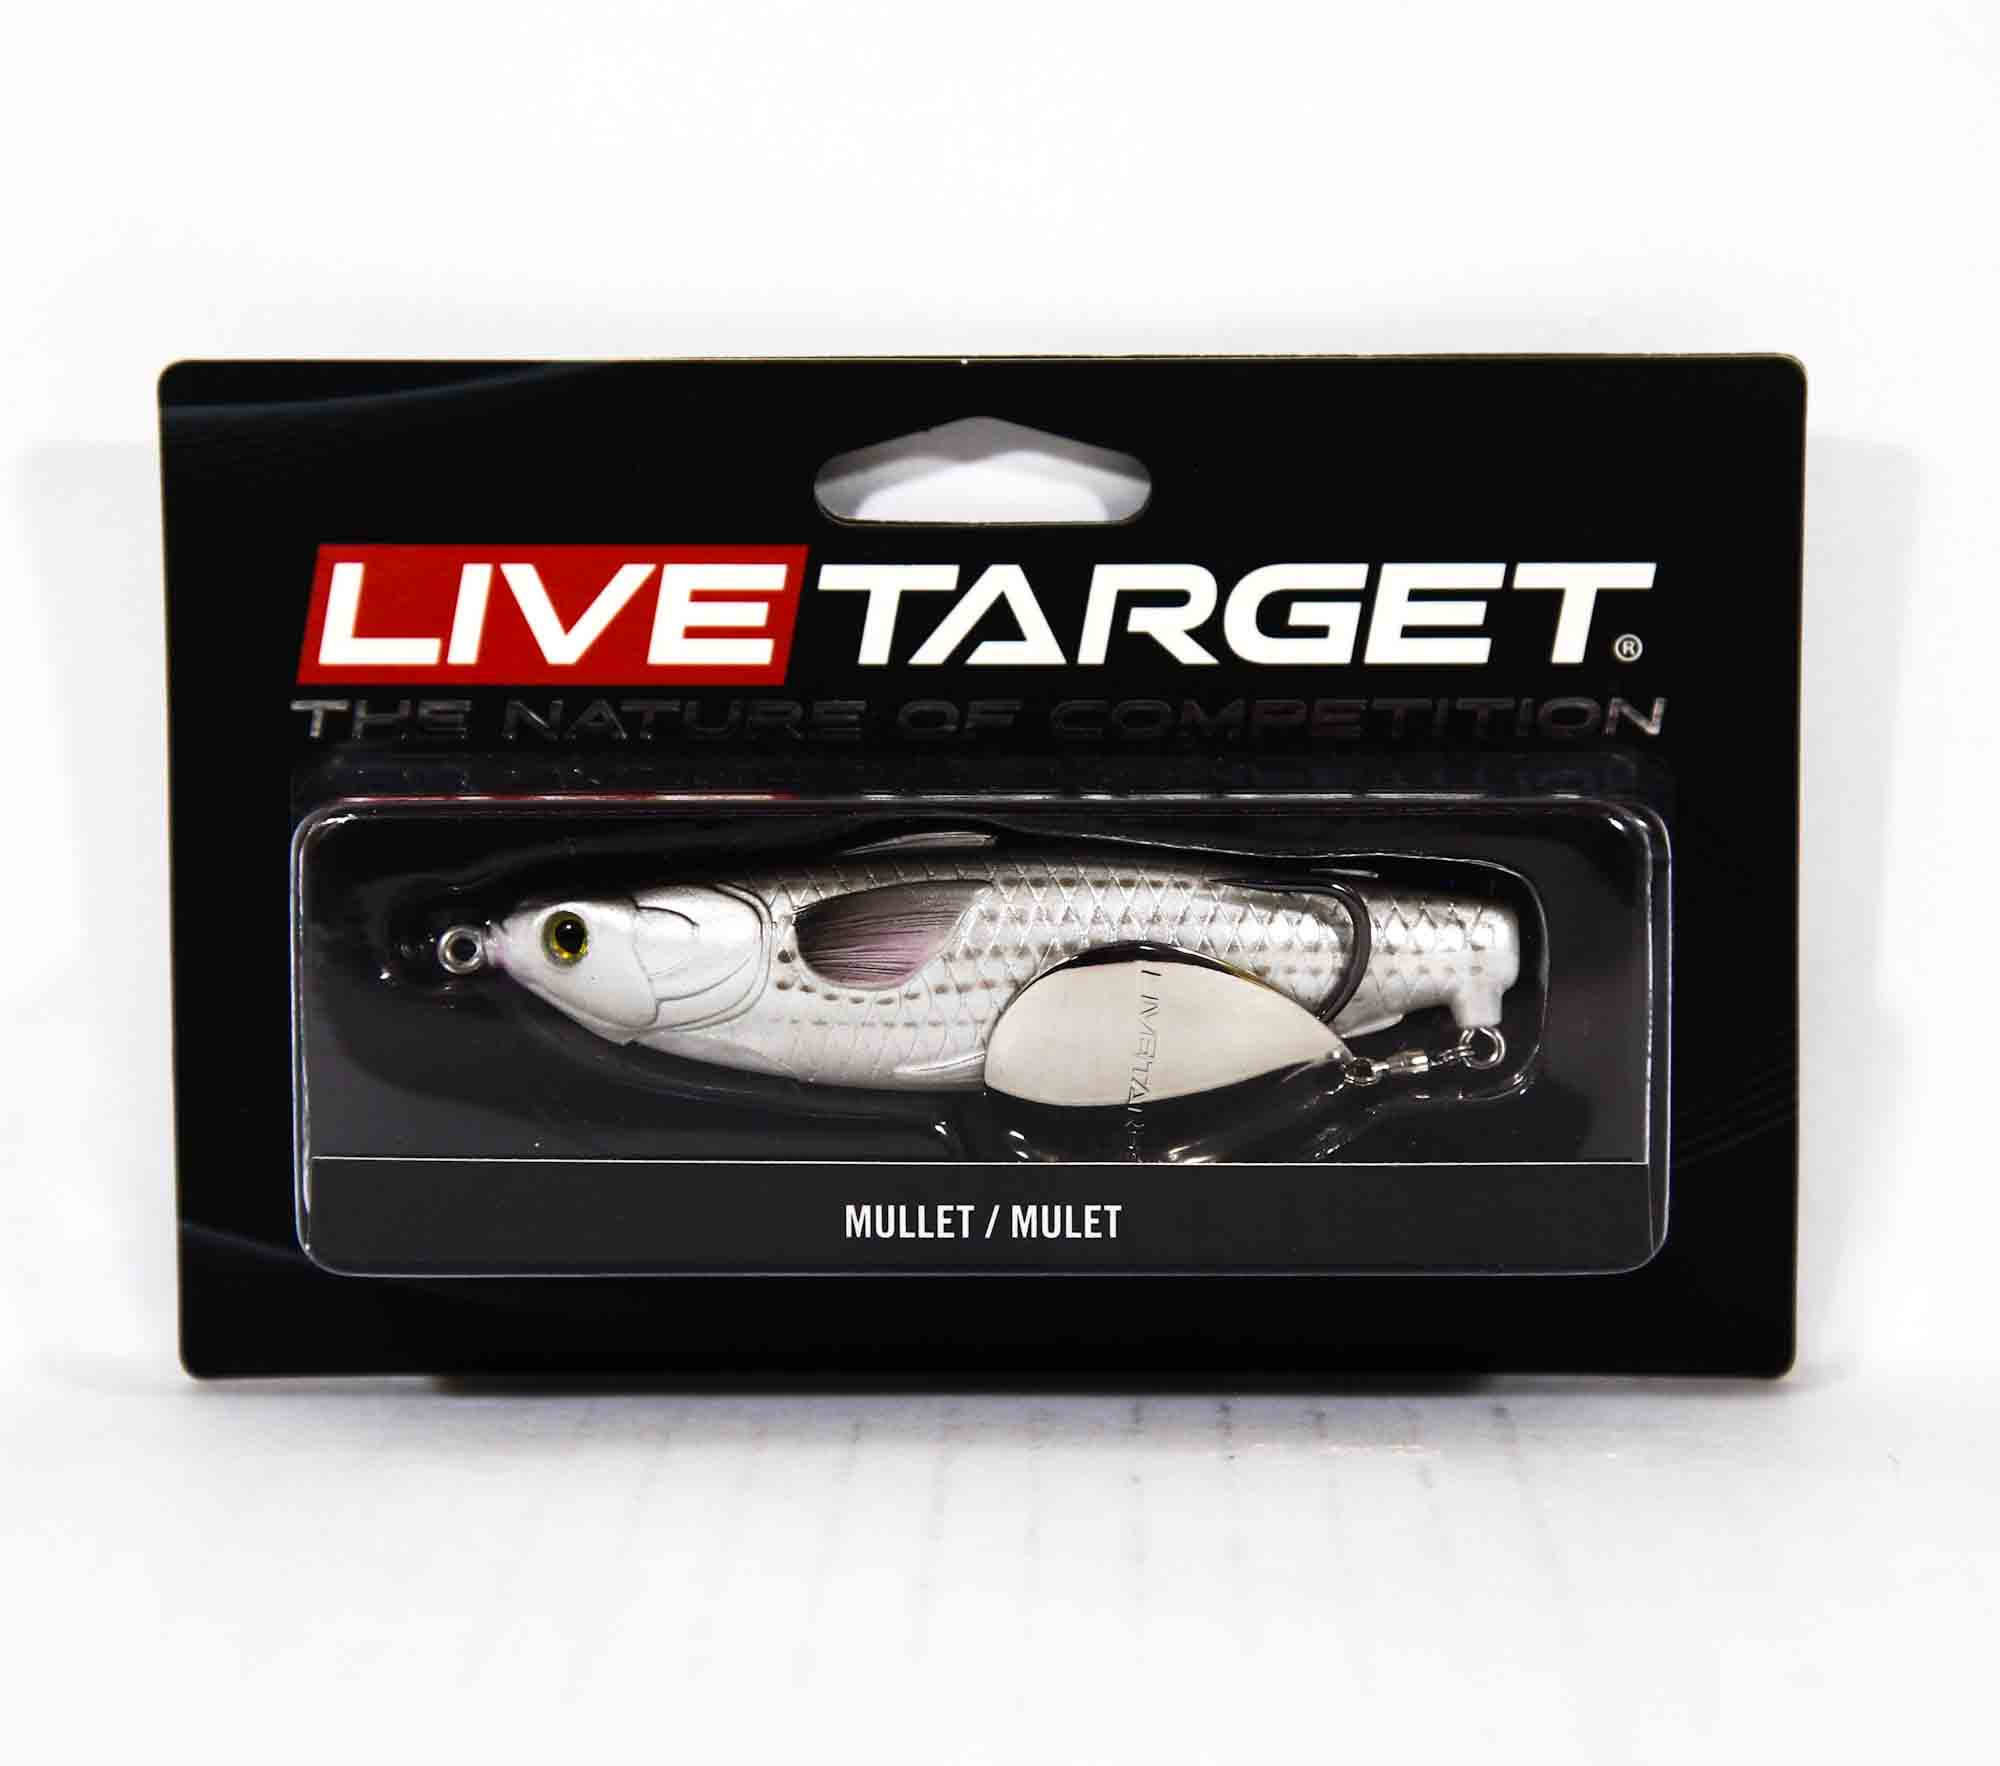 Live Target MCH100T721 Mullet Commotion Bait 4 Inch Natural Black (2617)